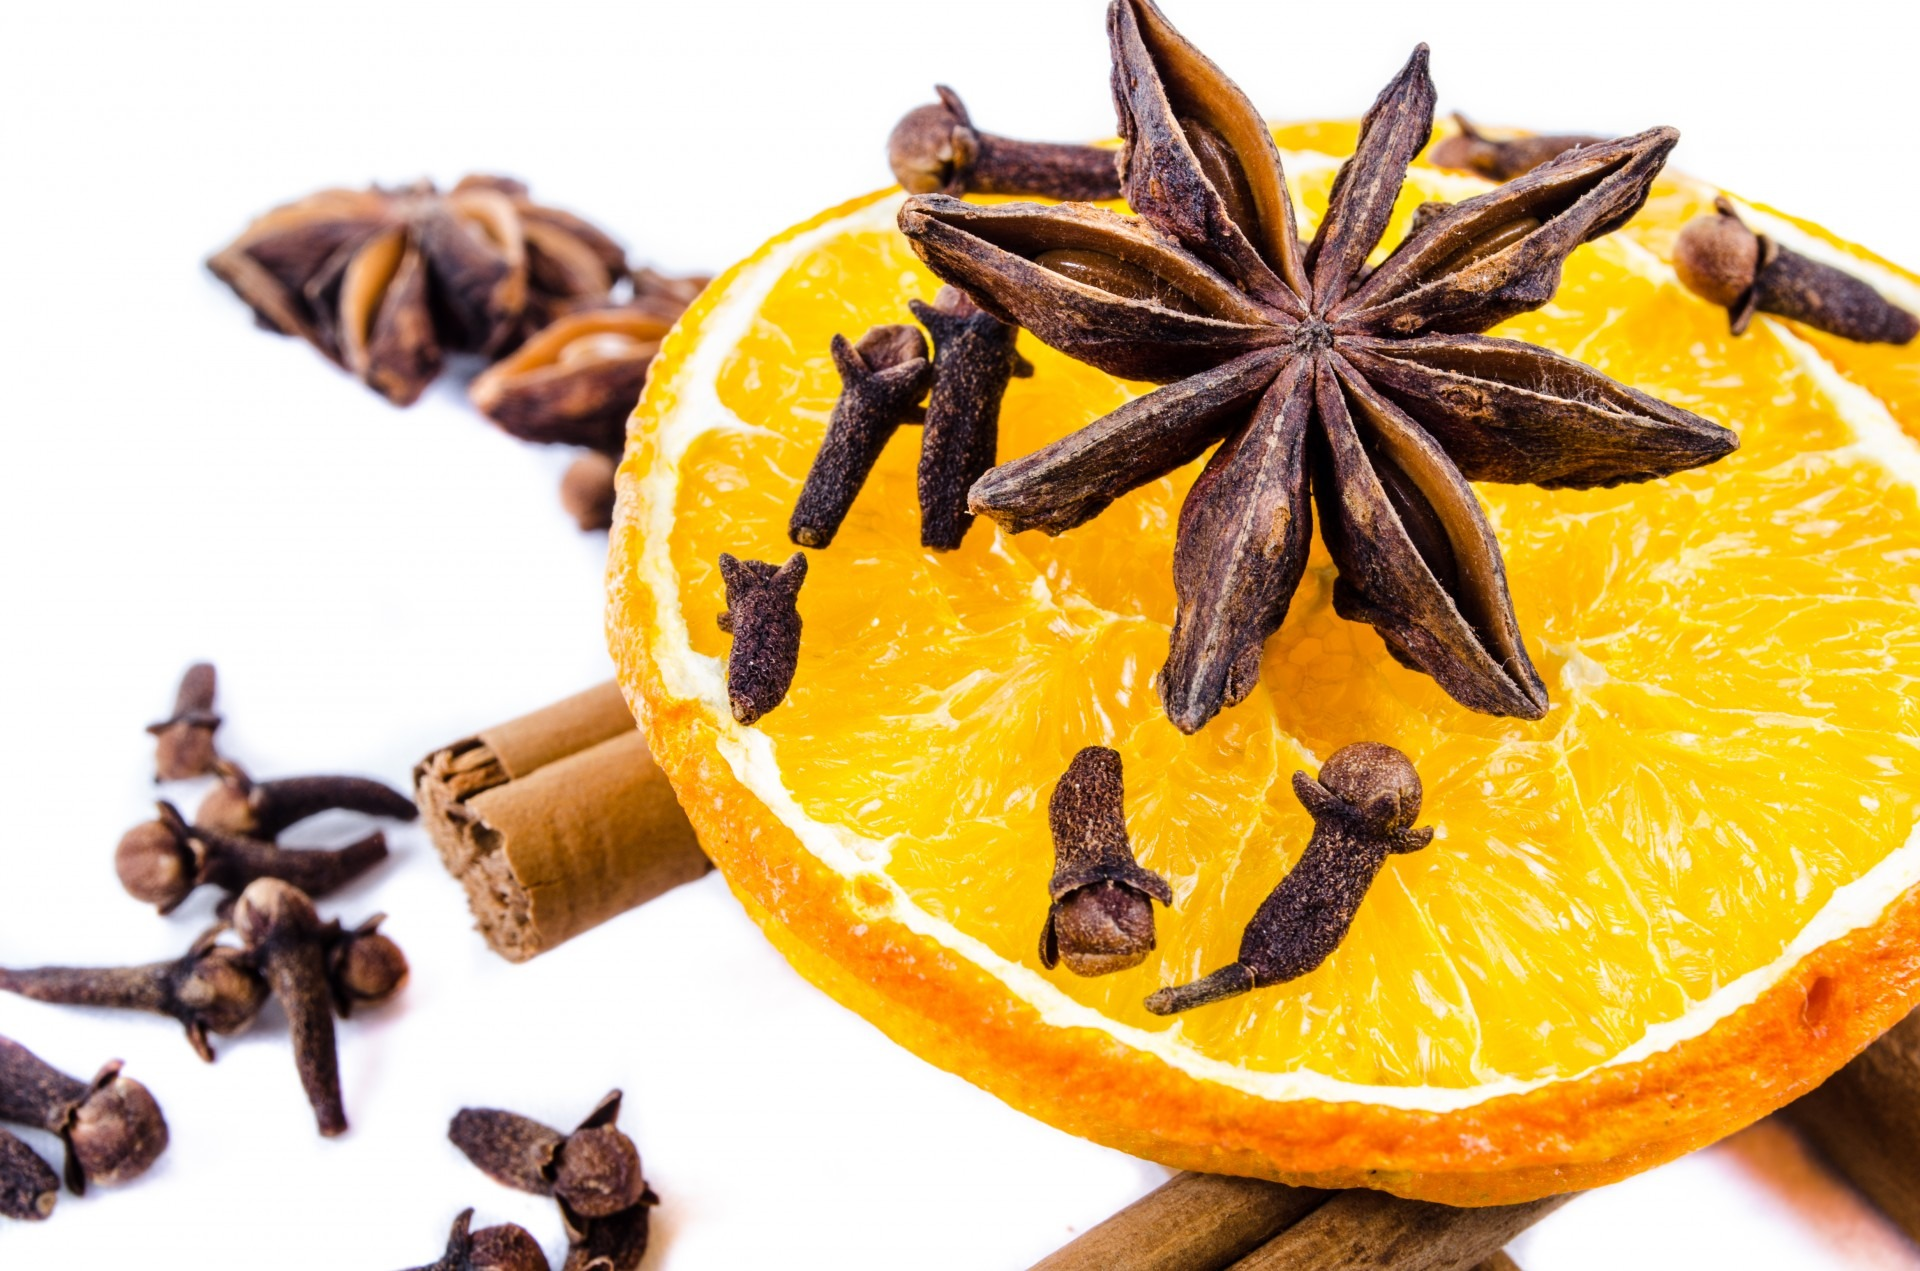 Mulled wine spices | PublicDomainPictures pixabay.com